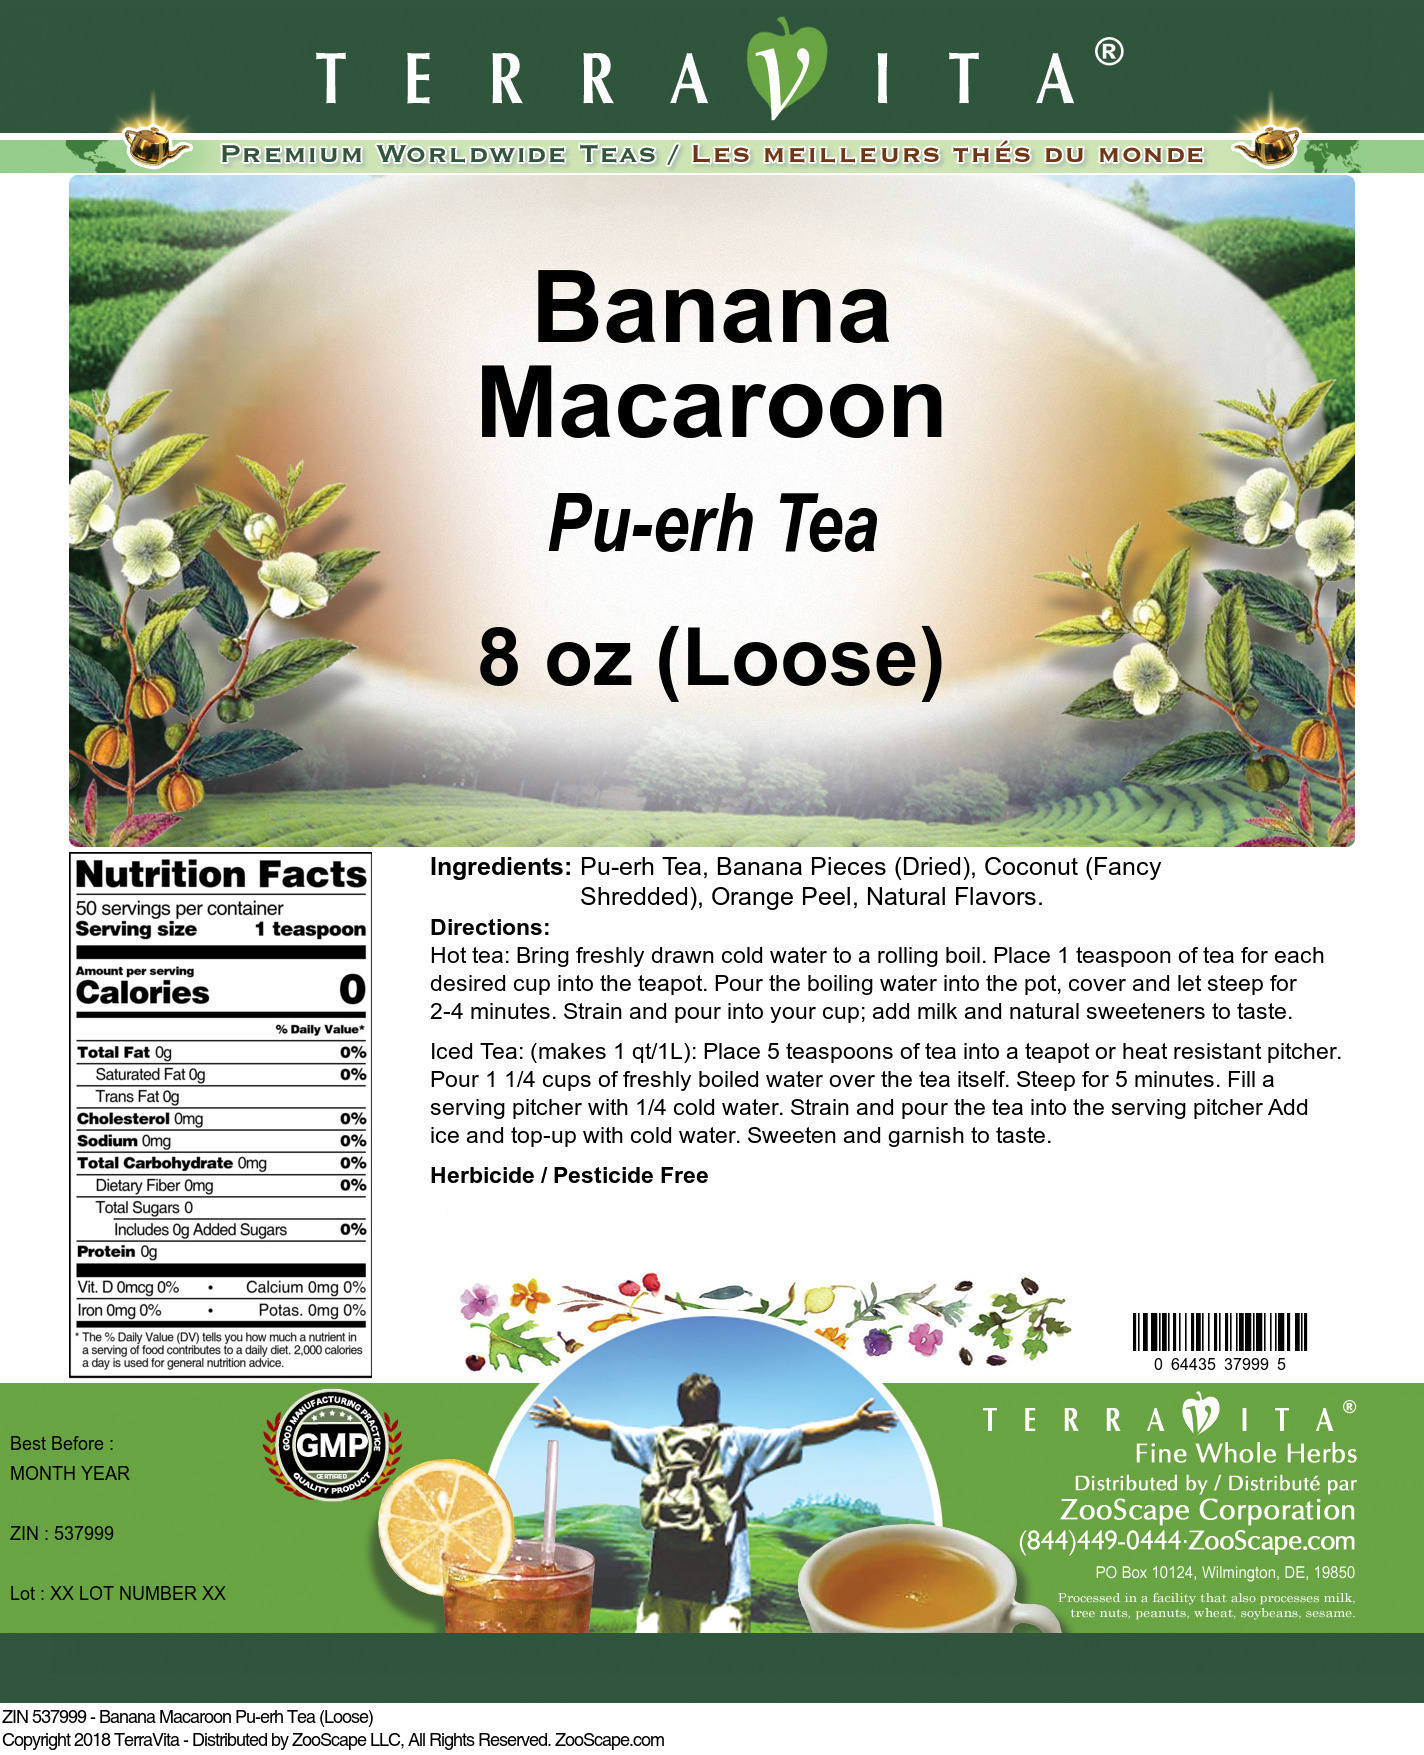 Banana Macaroon Pu-erh Tea (Loose)